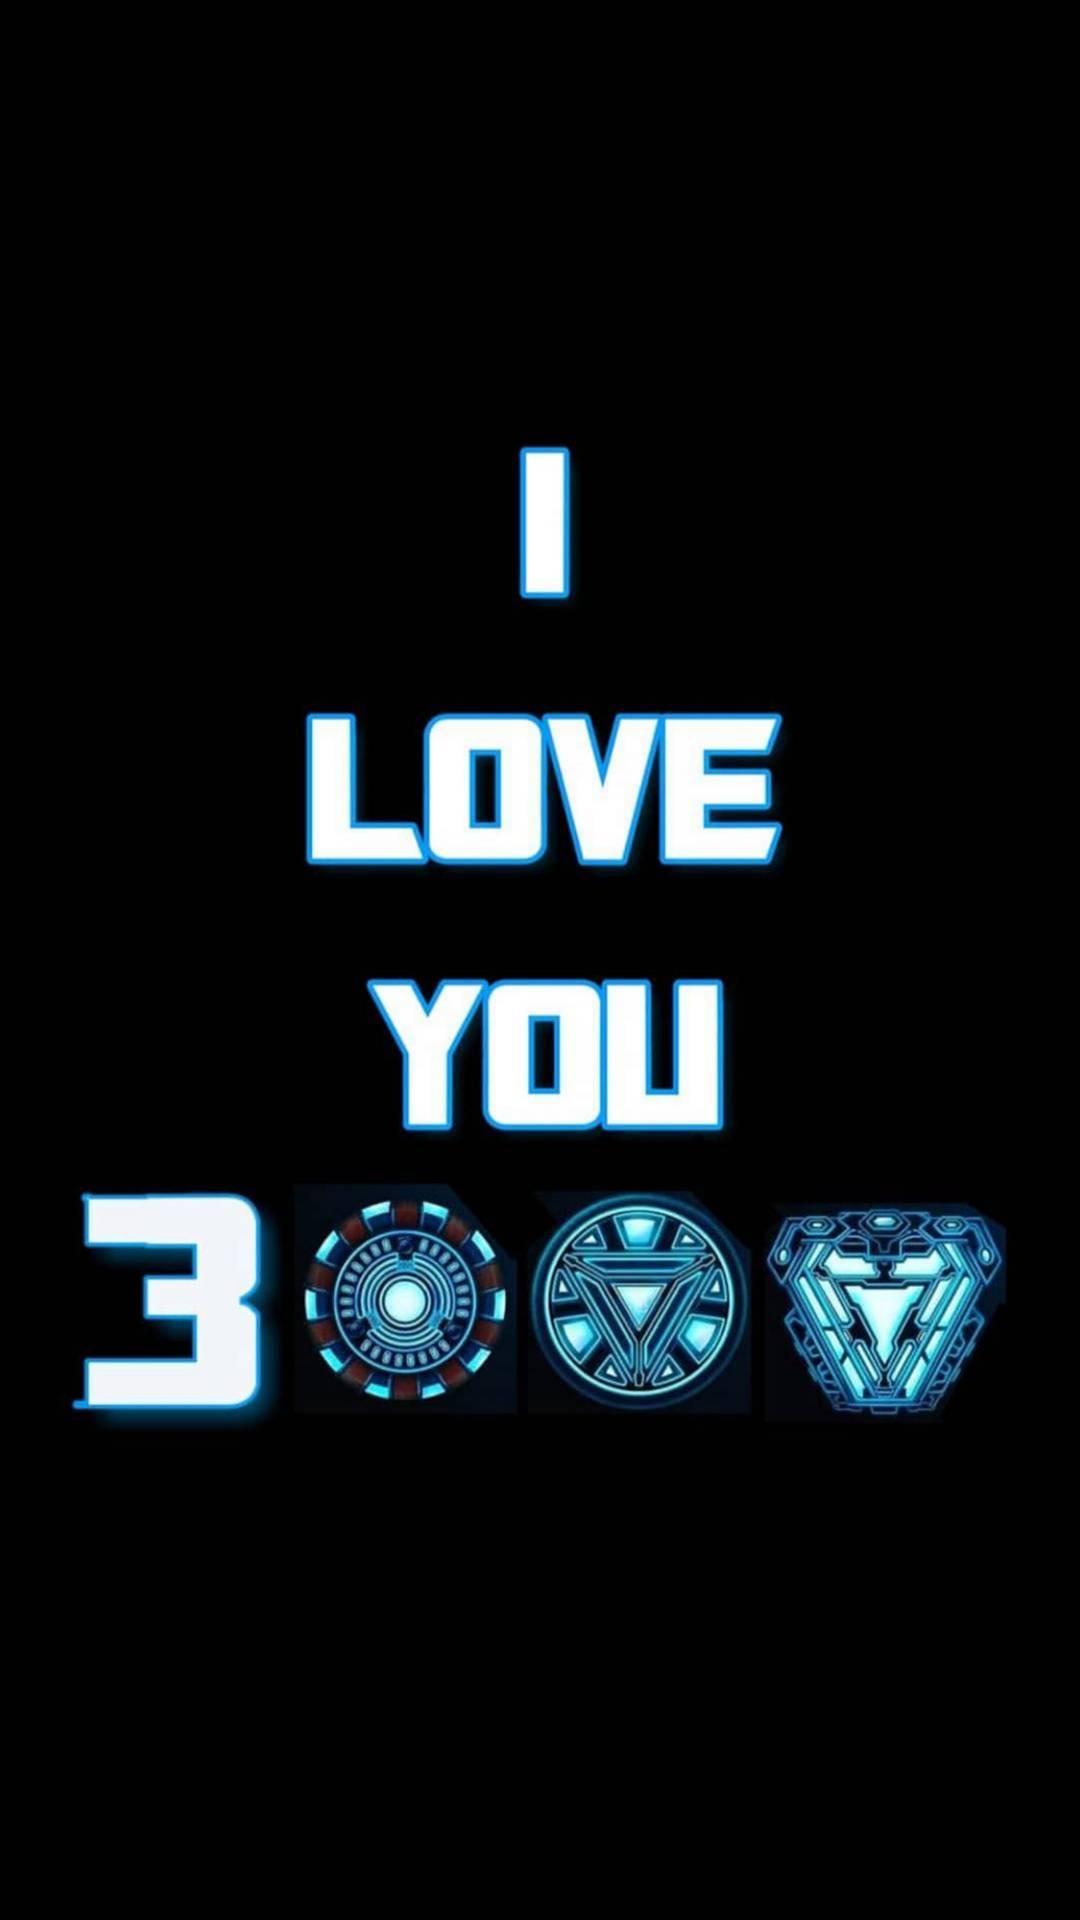 I Love You 3000 Iron Man Avengers iPhone Wallpaper